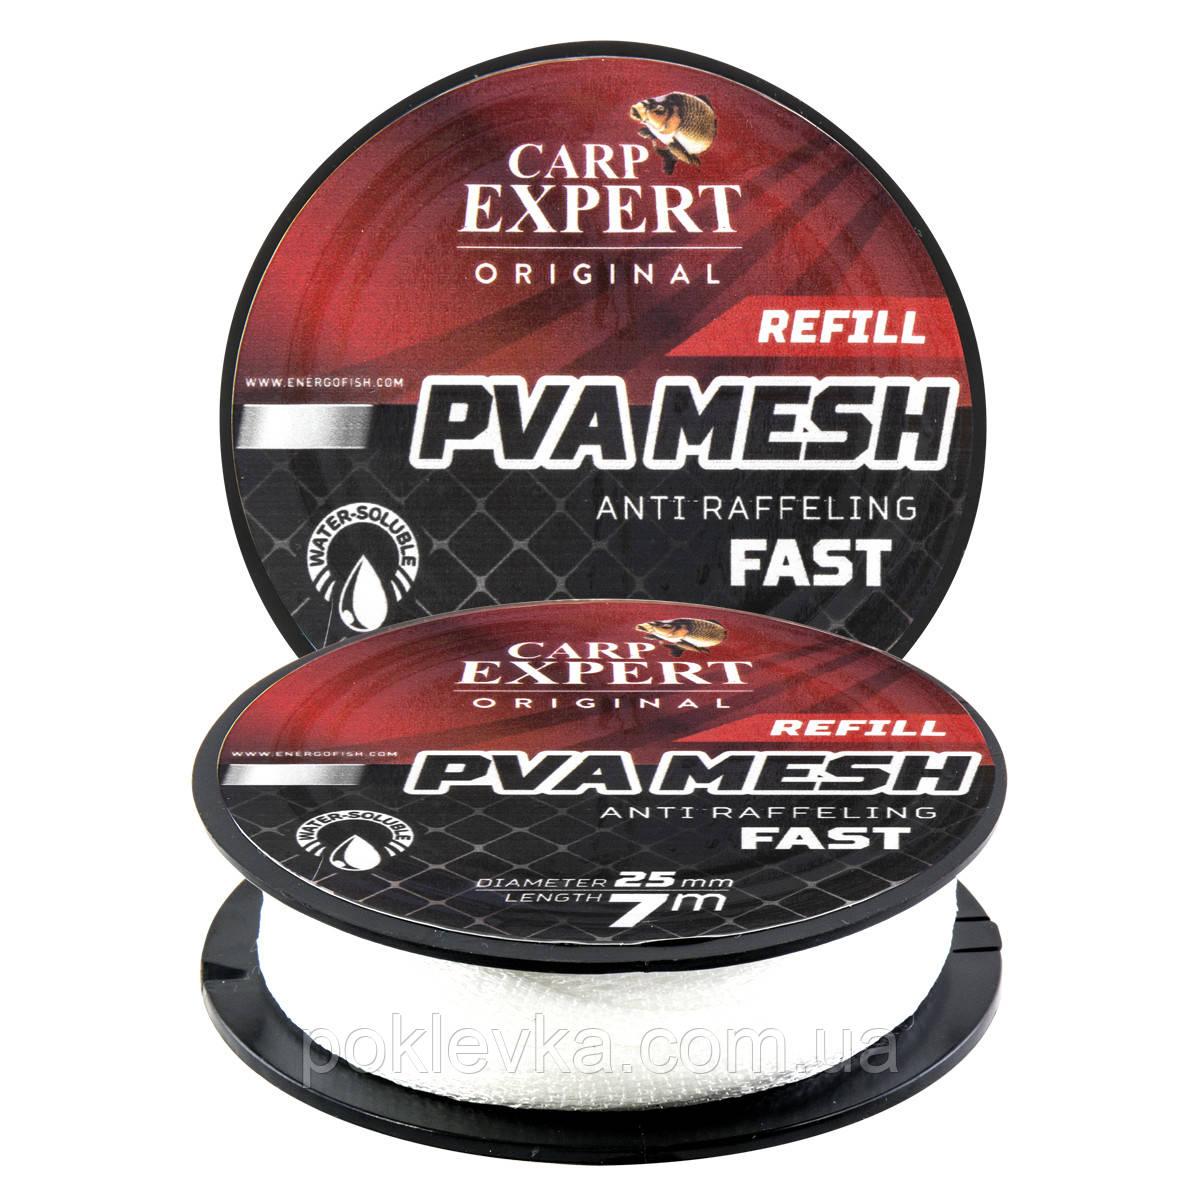 ПВА-сетка 7м 25мм на шпуле Energofish Carp Expert PVA Refill Mesh Anti Raffeling Fast (30141525)